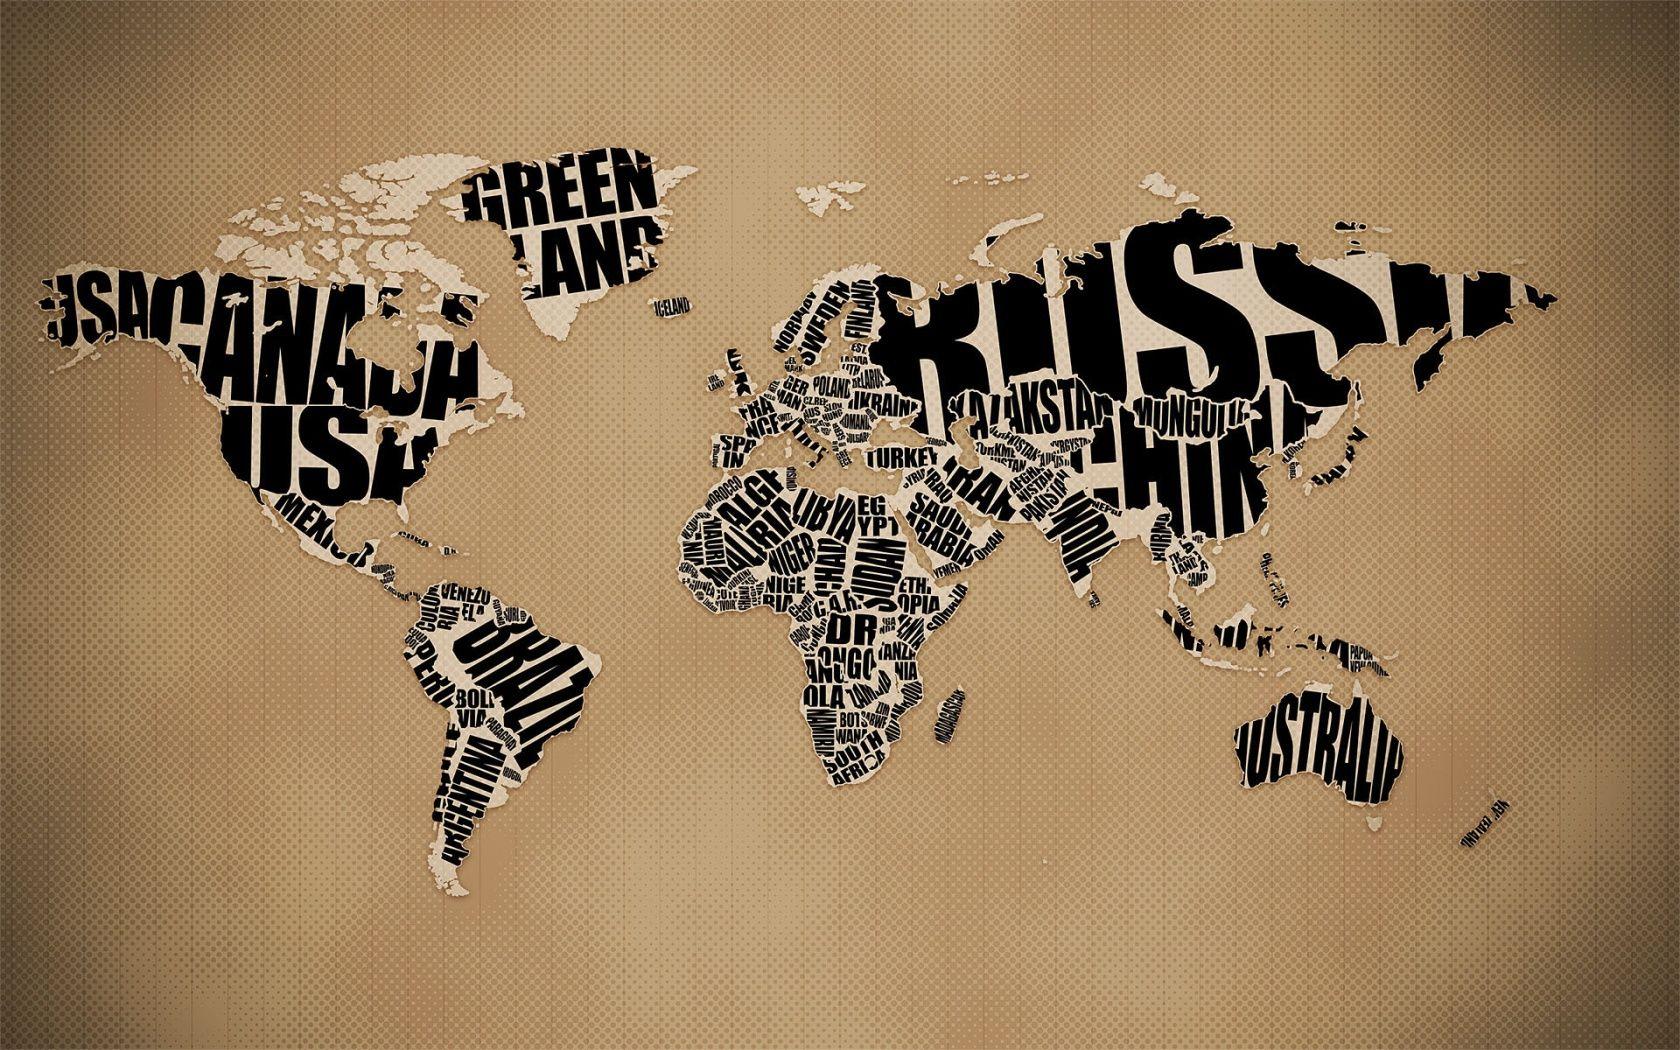 unusual_world_map-1680x1050.jpg (1680×1050)